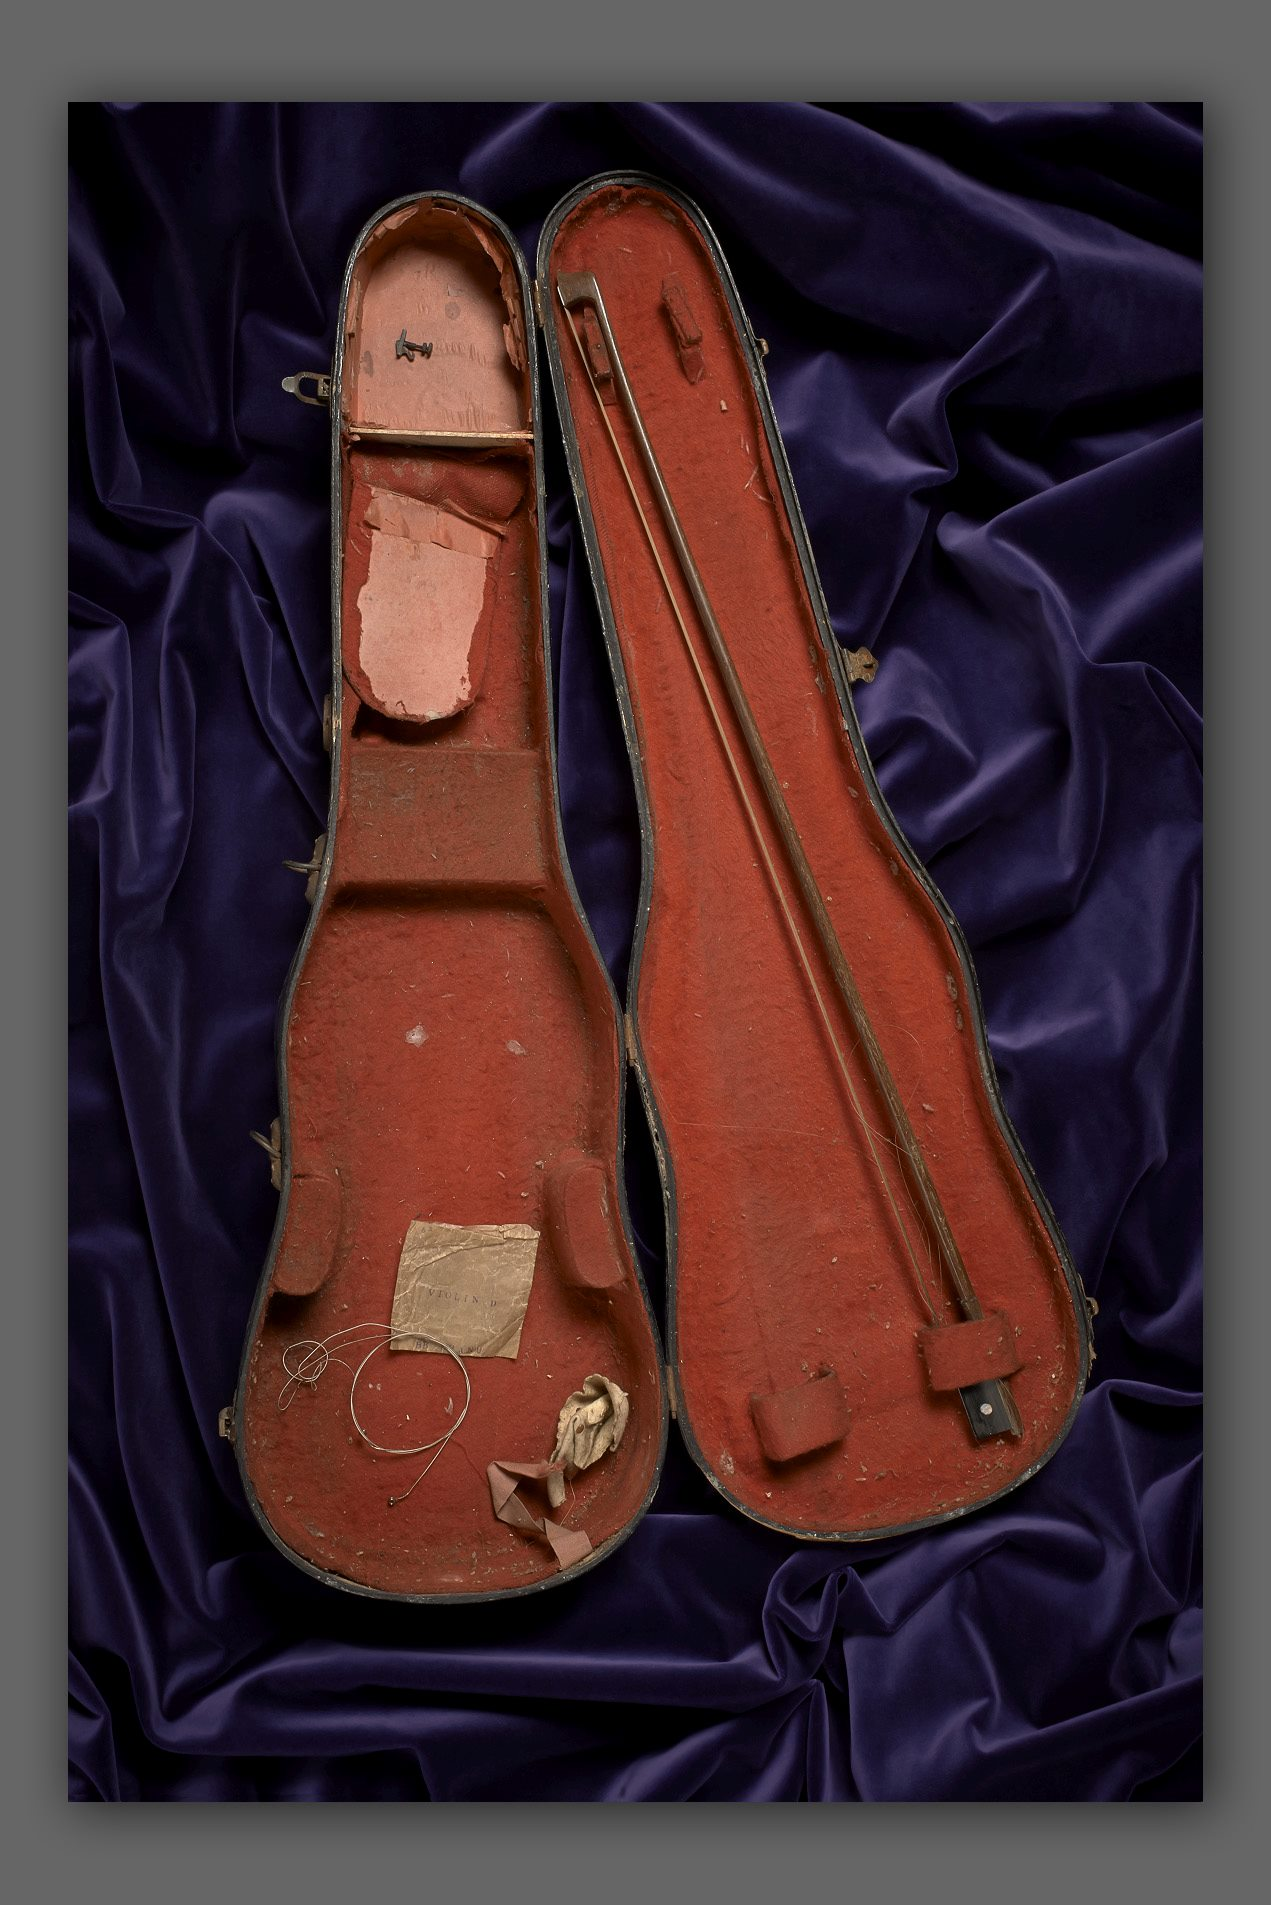 Violin Cases - Joan Molloy